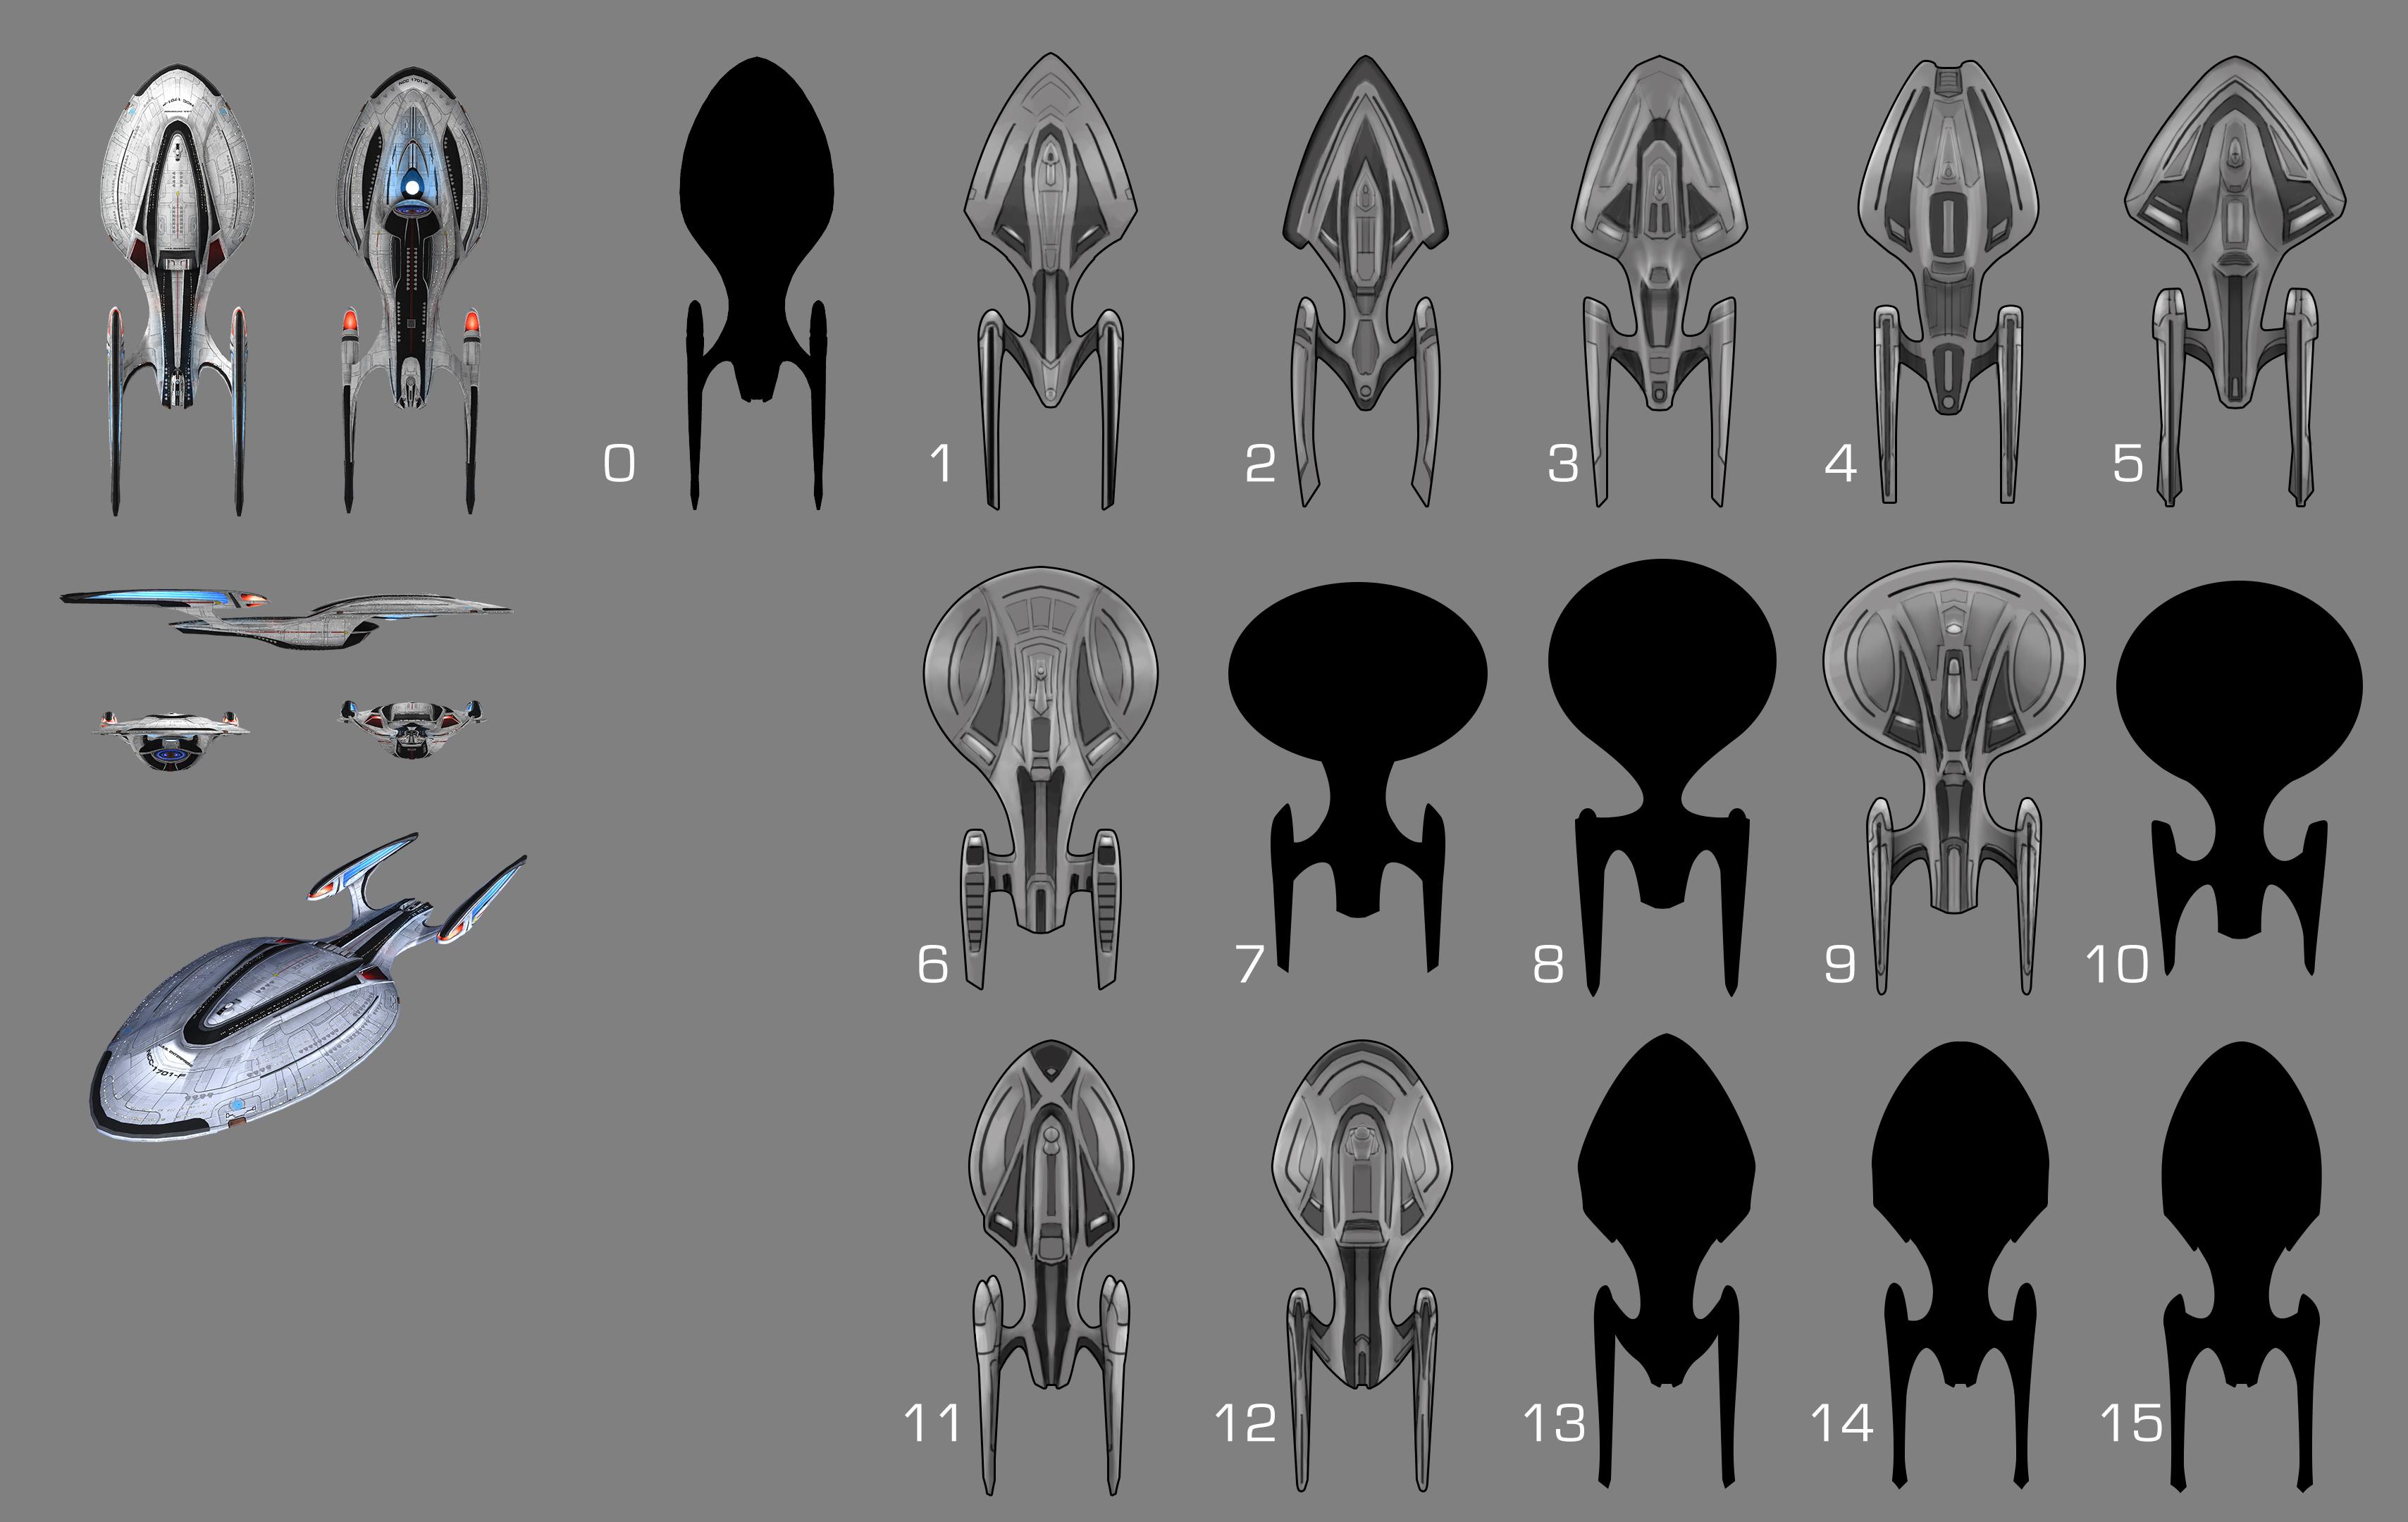 Design of Odyssey